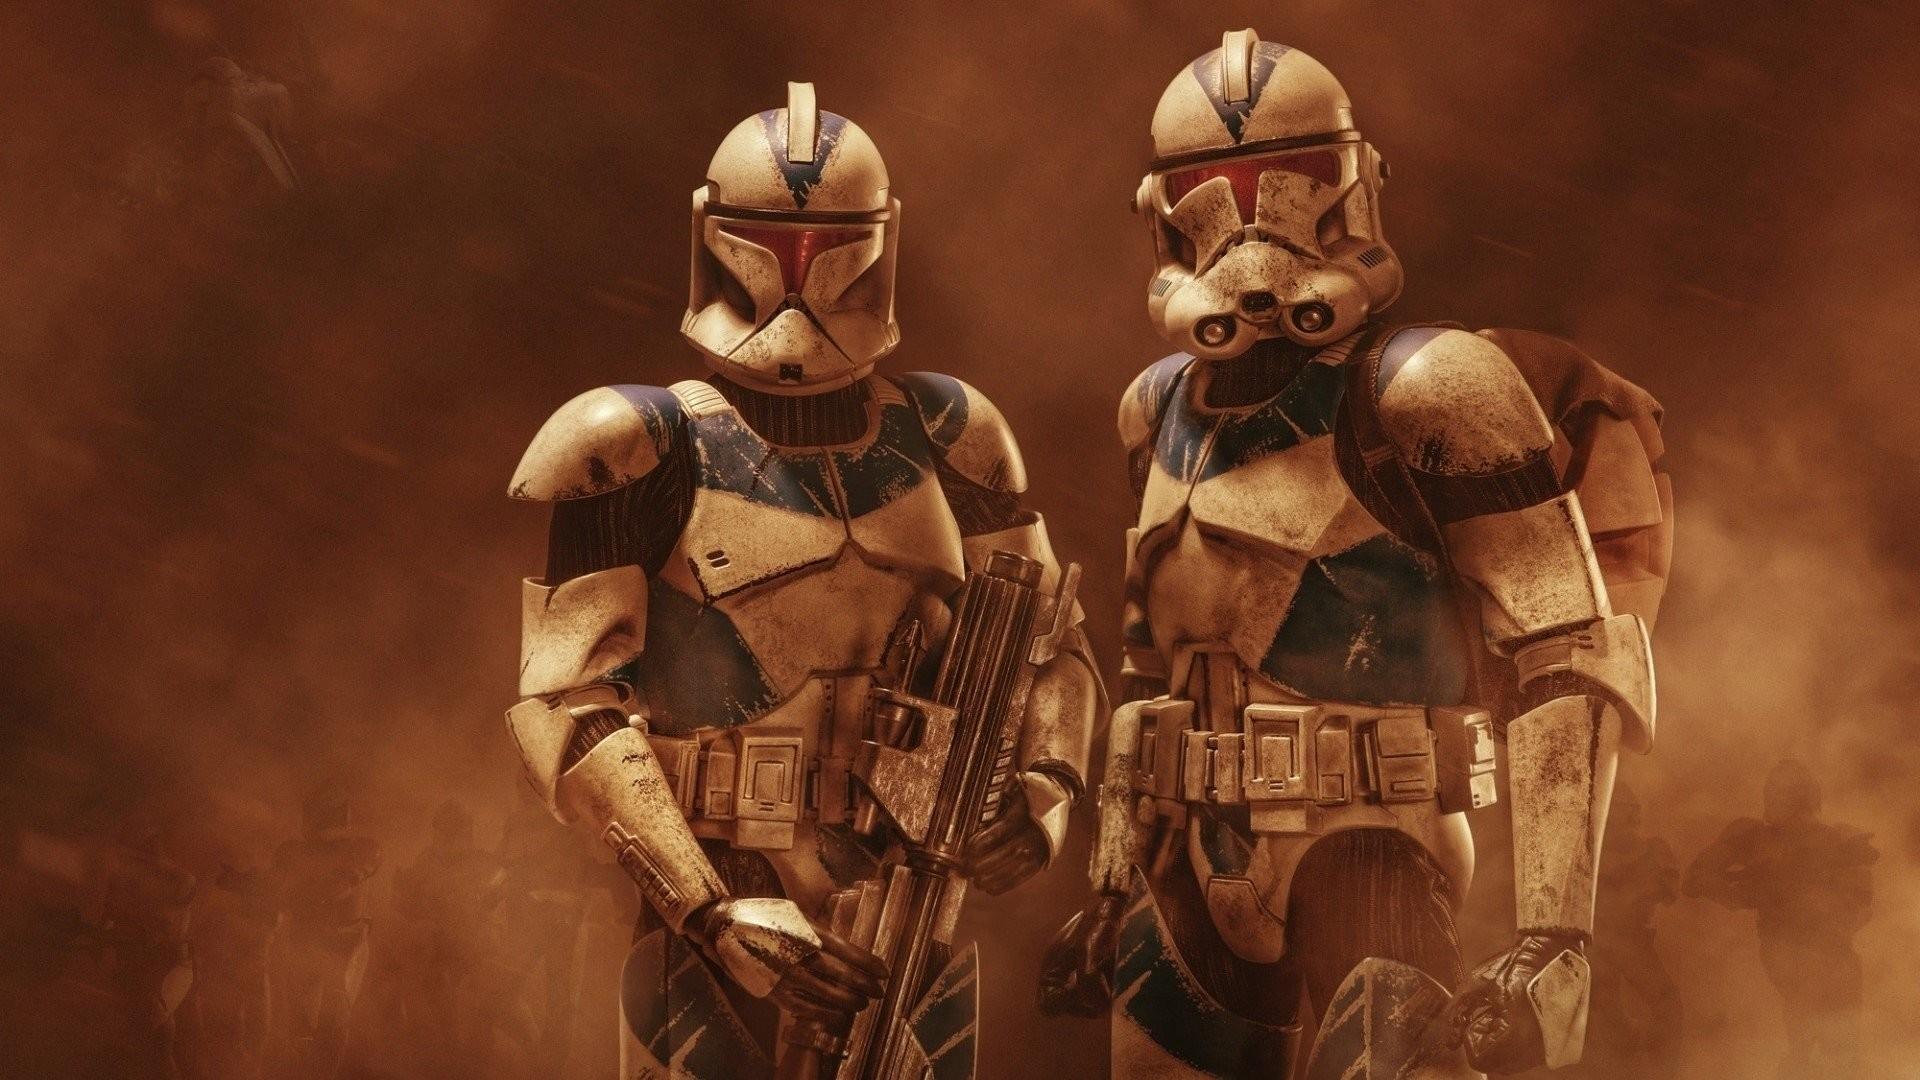 star wars clone trooper wallpaper. Black Bedroom Furniture Sets. Home Design Ideas